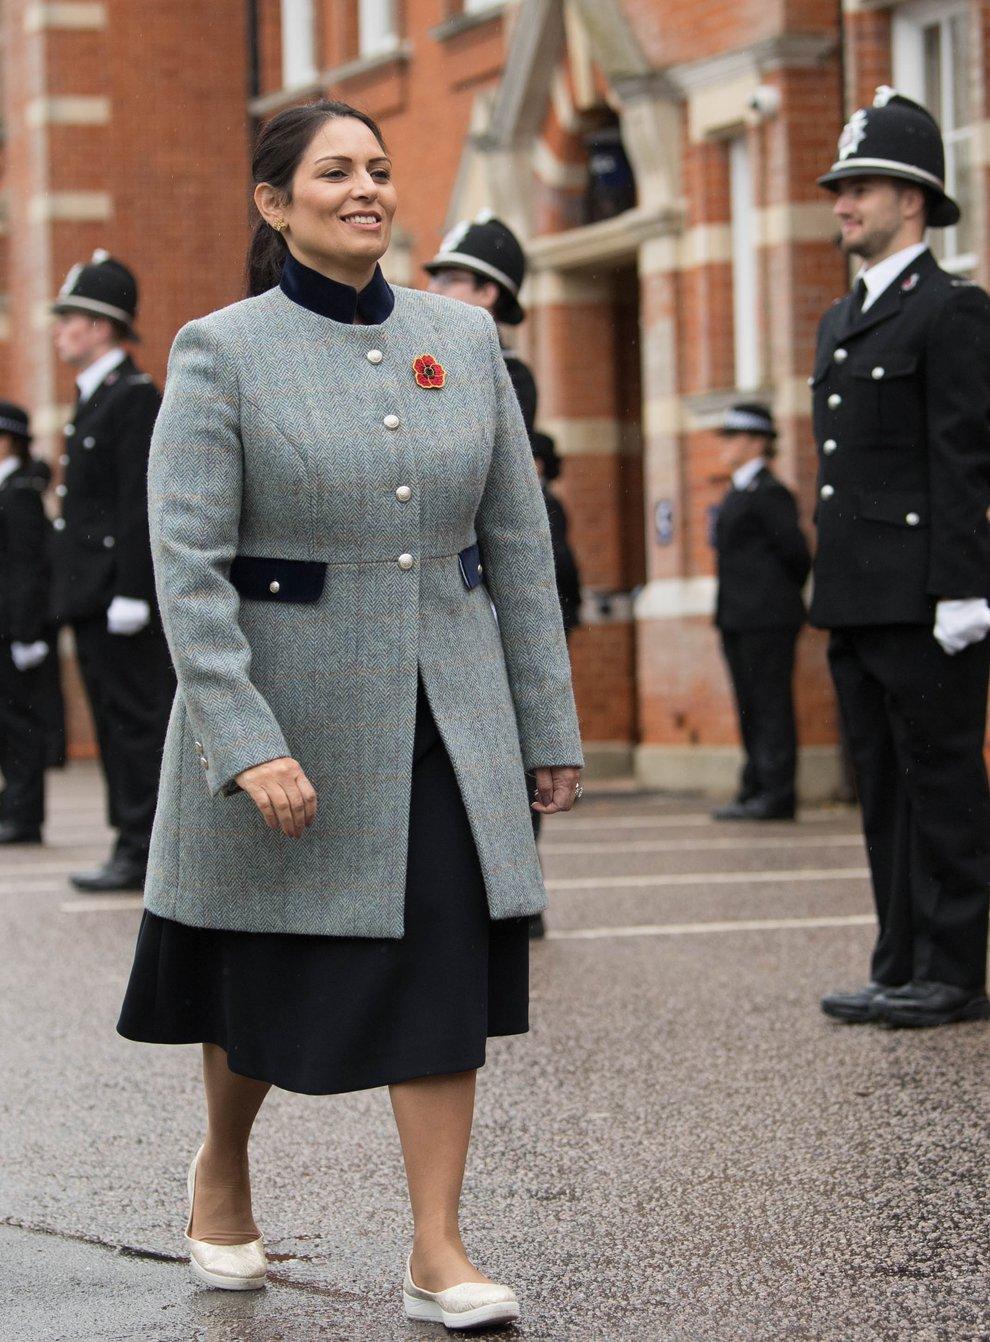 Home Secretary Priti Patel inspects new police recruits (Stefan Rousseau/PA)